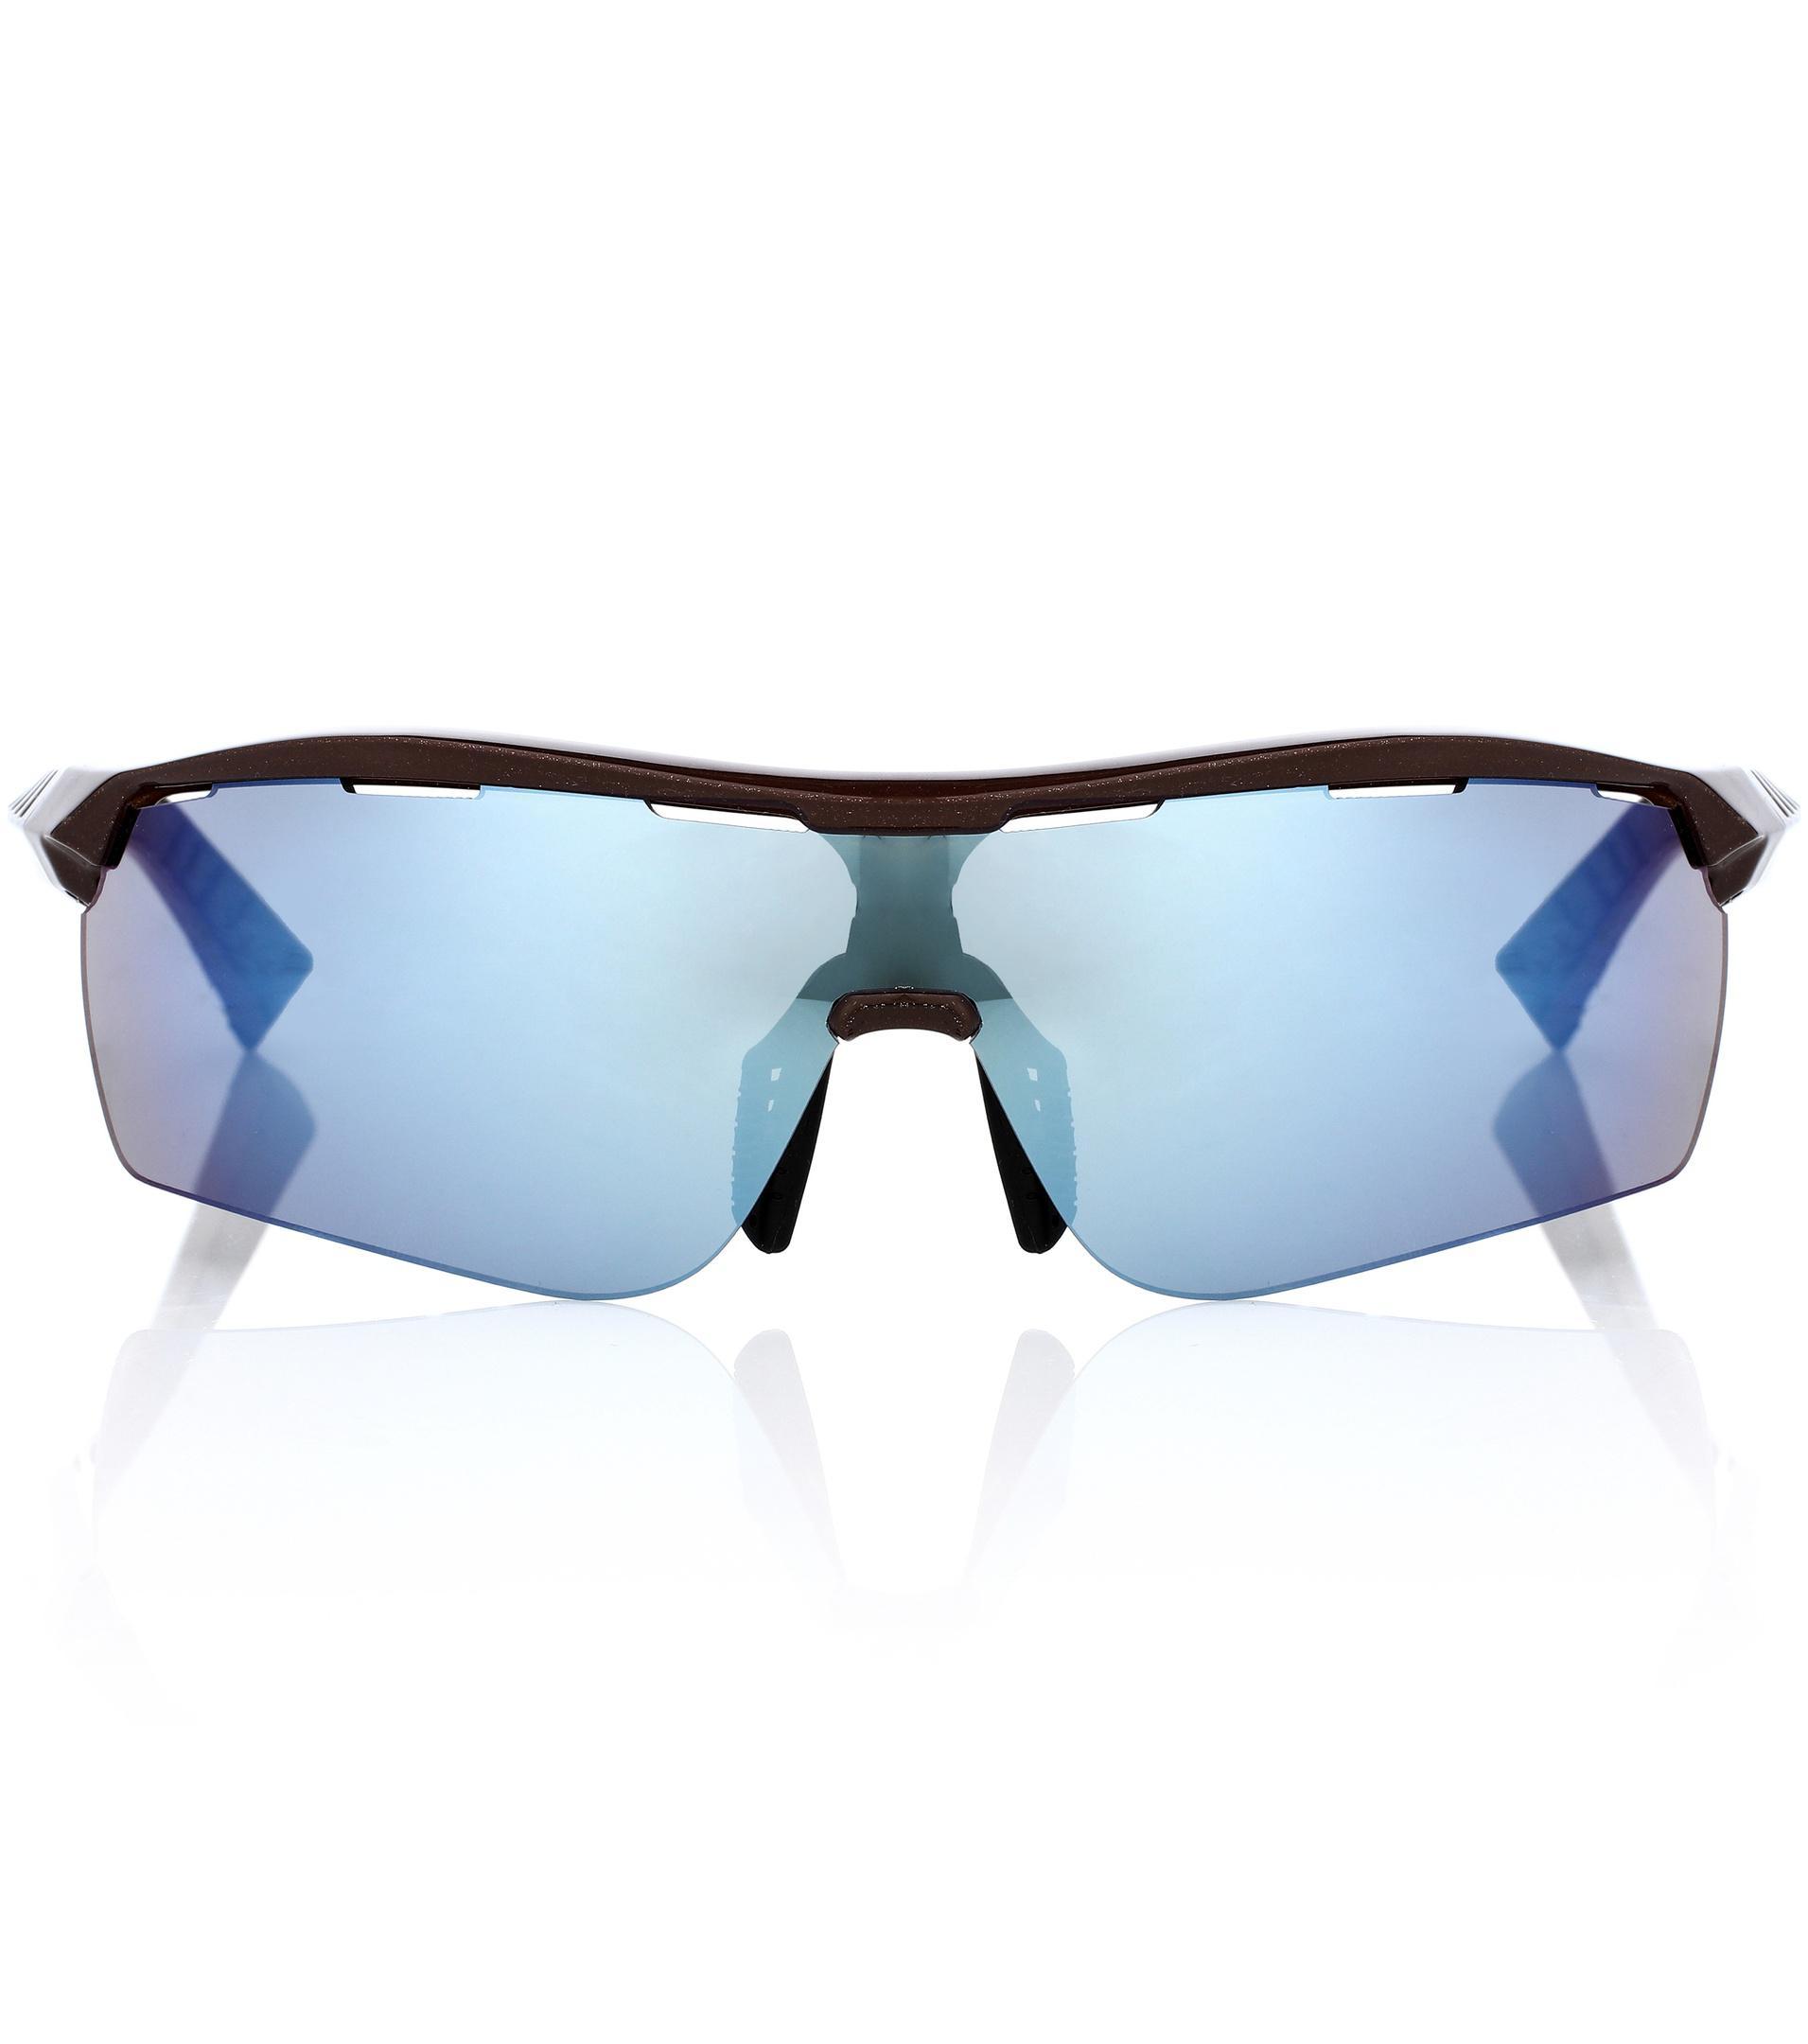 Turbo Wrap D-frame Acetate Mirrored Sunglasses - Fuchsia Stella McCartney b54iuSzJkI